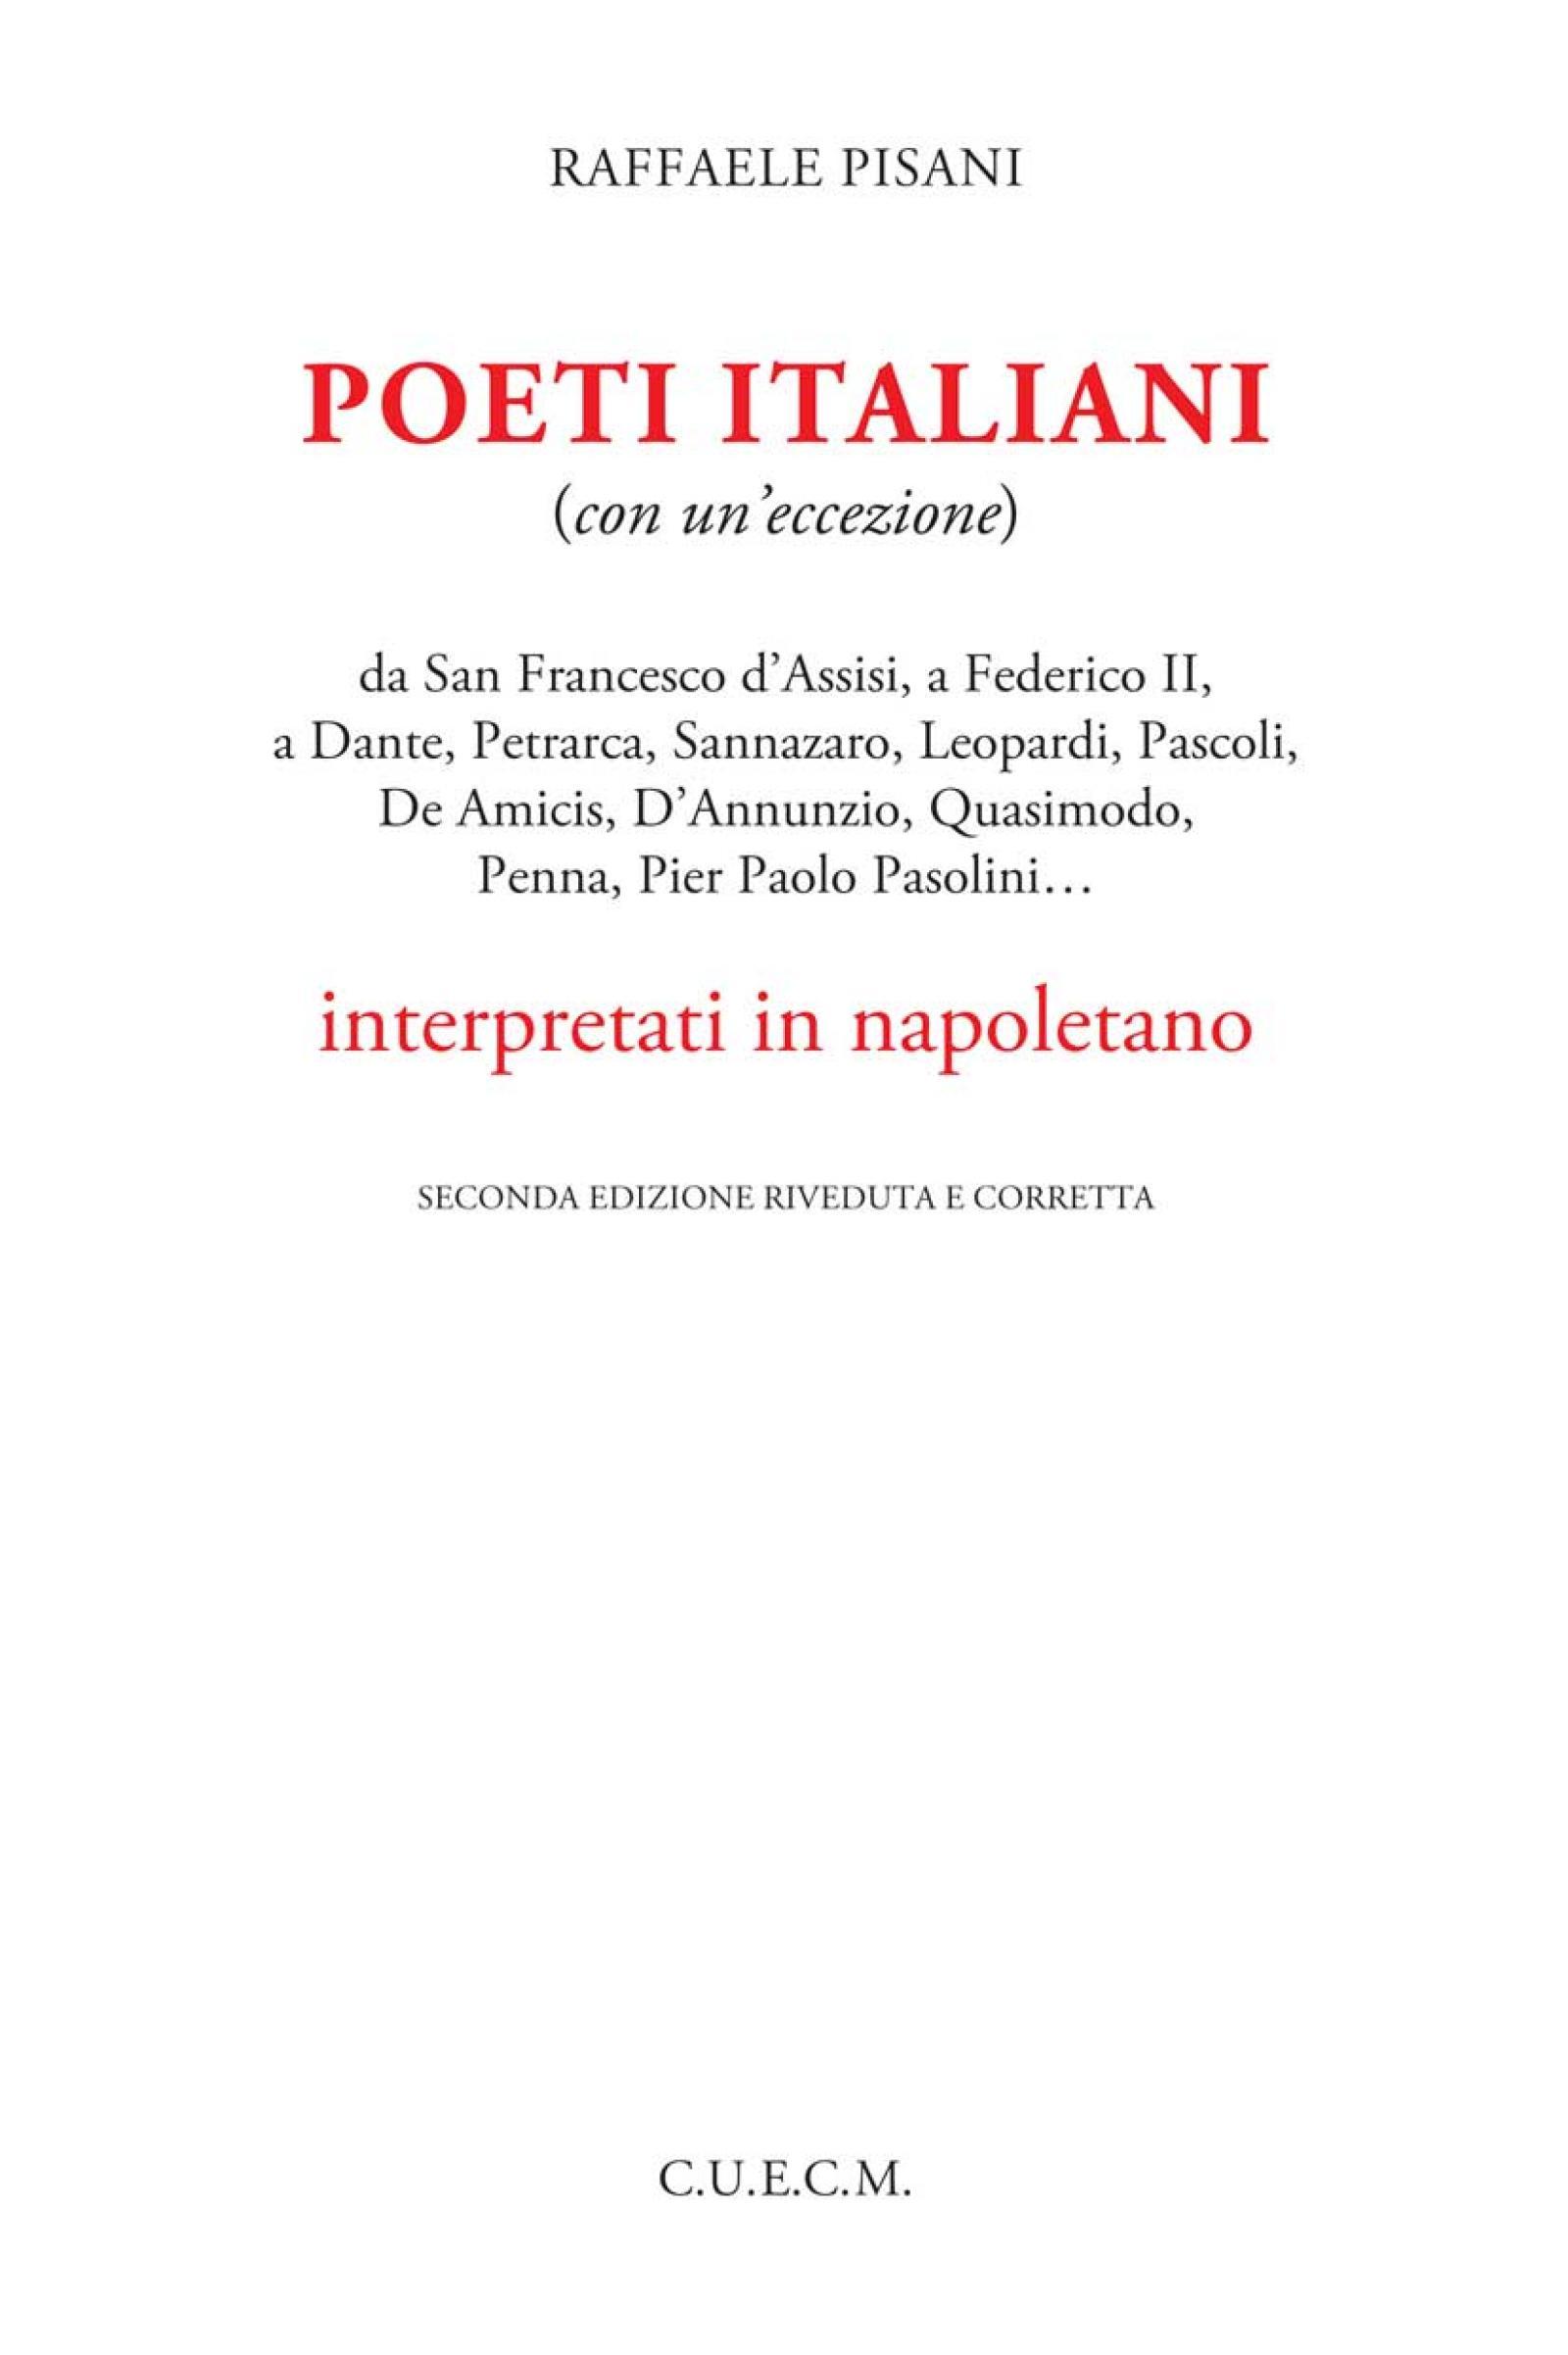 Poeti italiani in napoletano